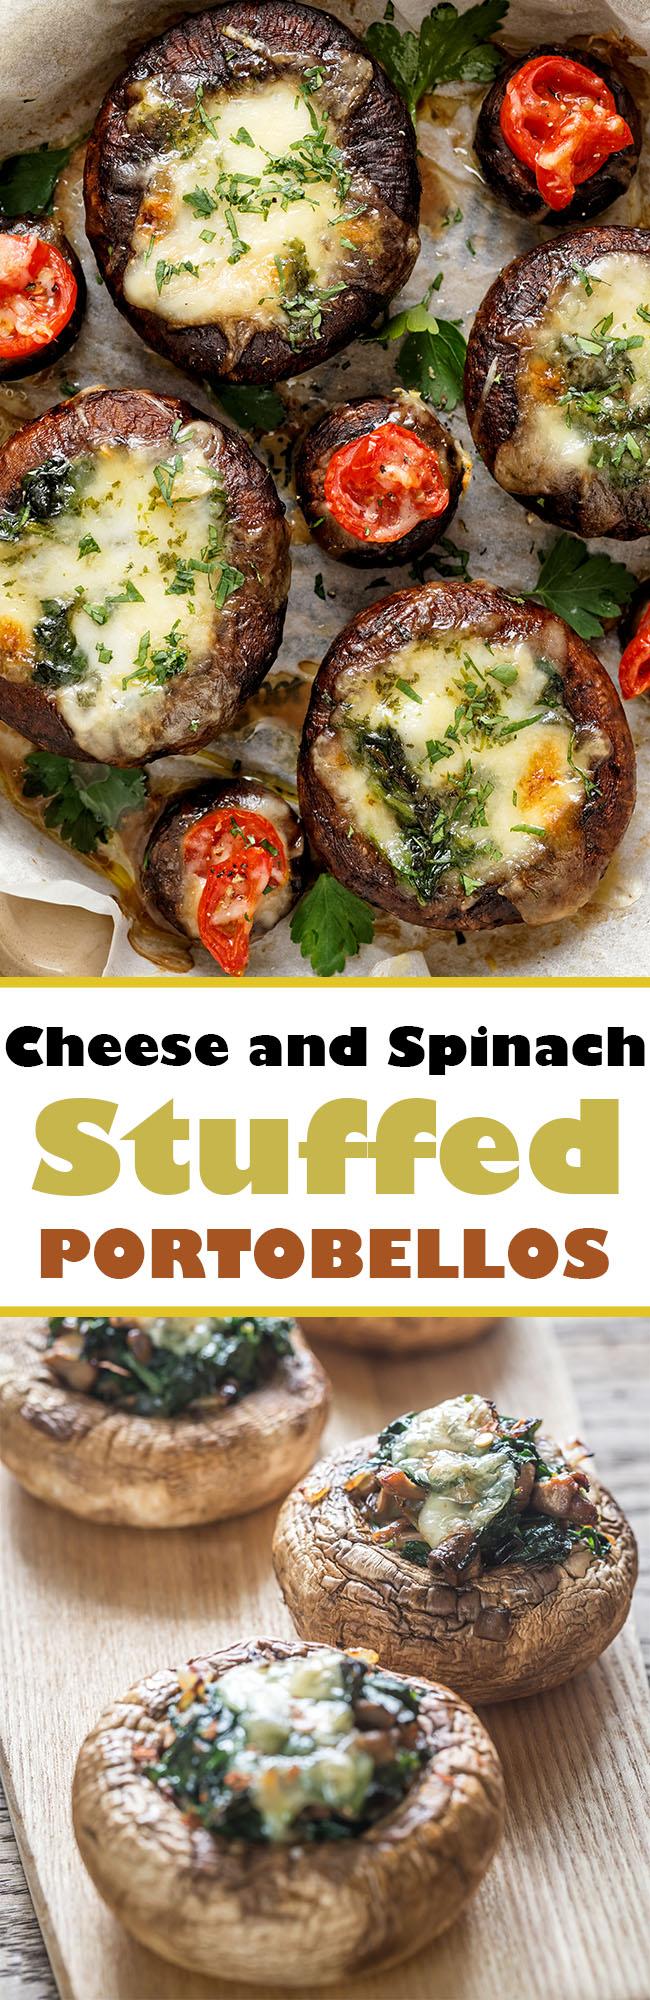 Cheese and Spinach #Stuffed #Portobellos